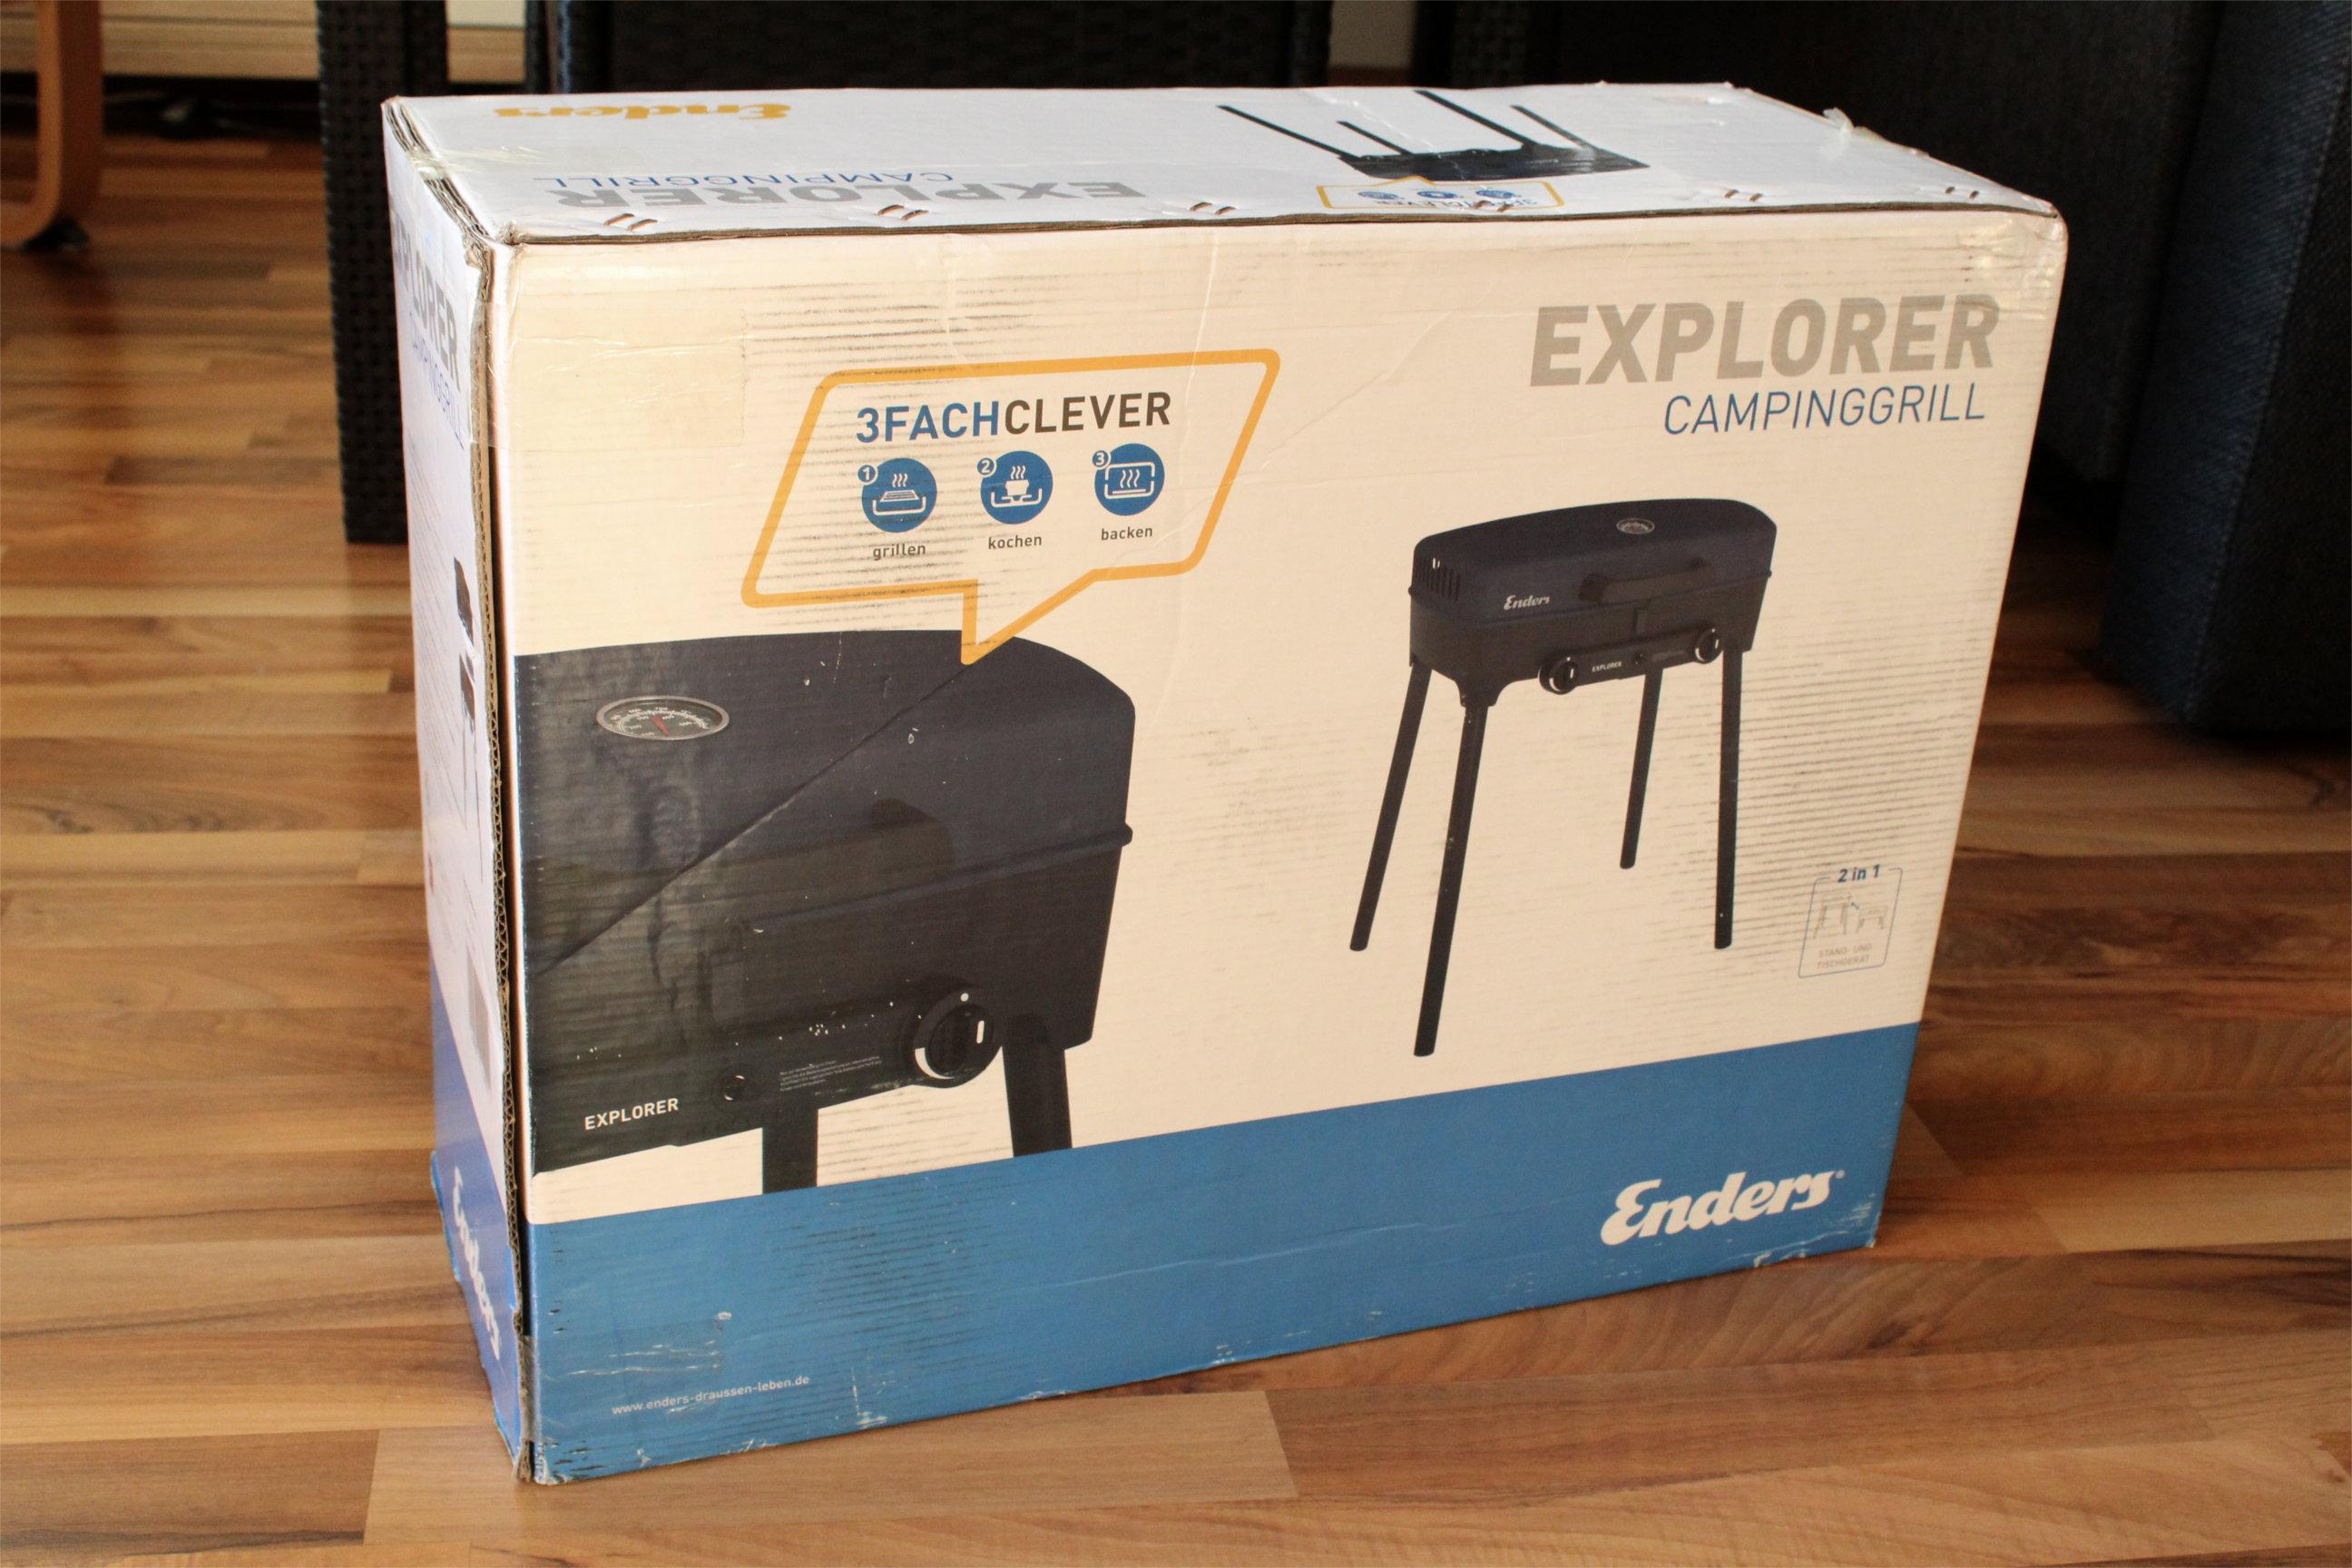 Enders Gasgrill Explorer : Campinggrill test enders explorer gasgrill u das grillmanifest